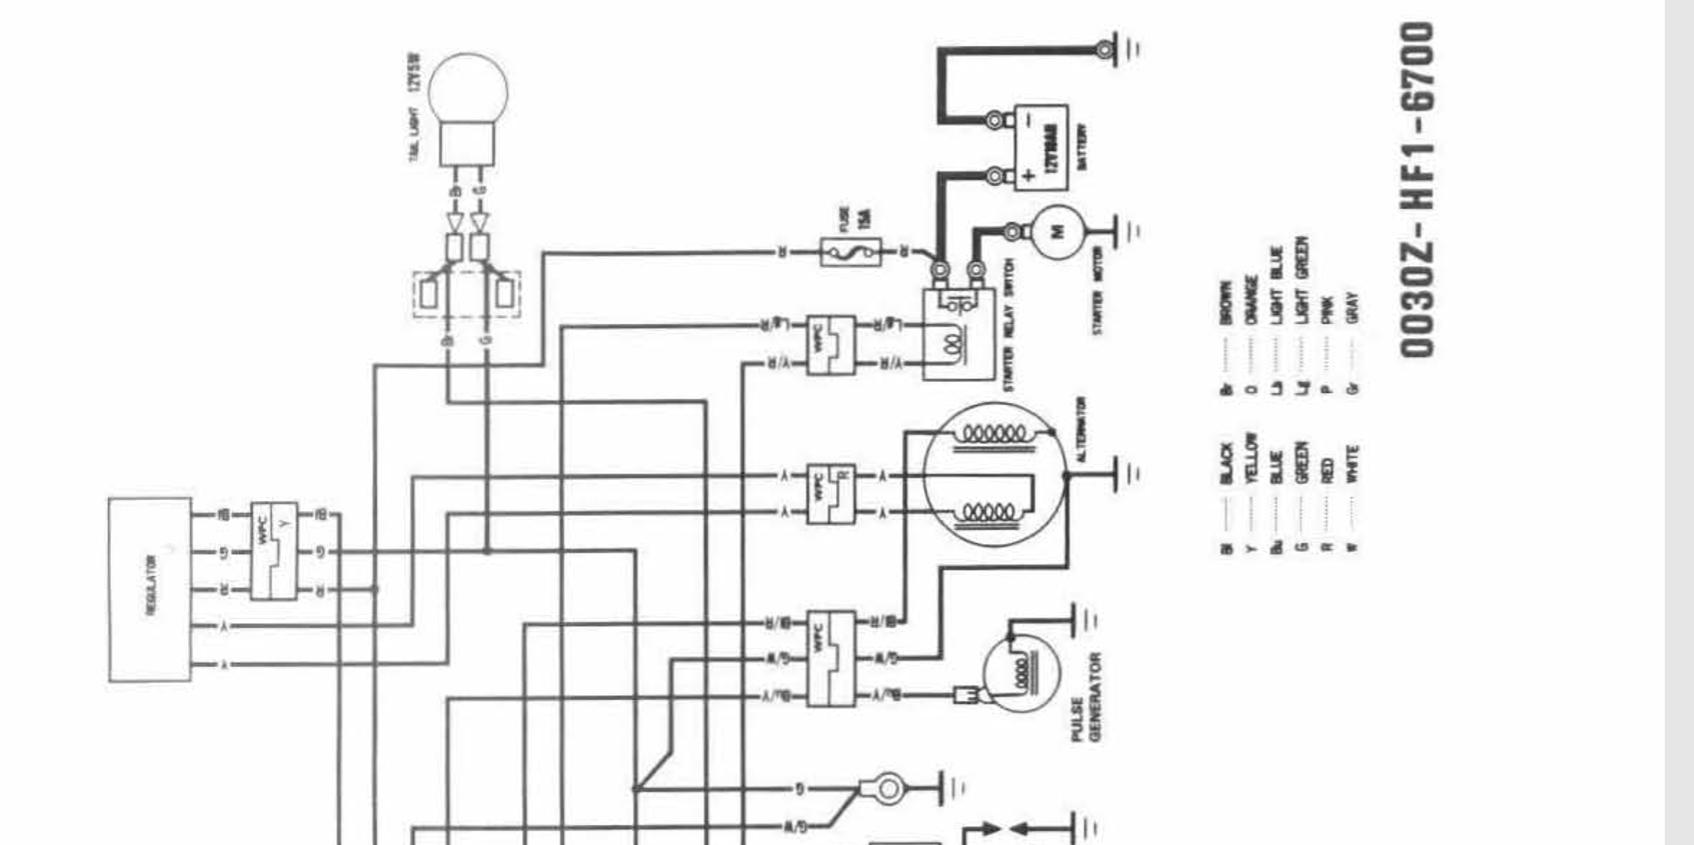 99 300ex wiring diagram